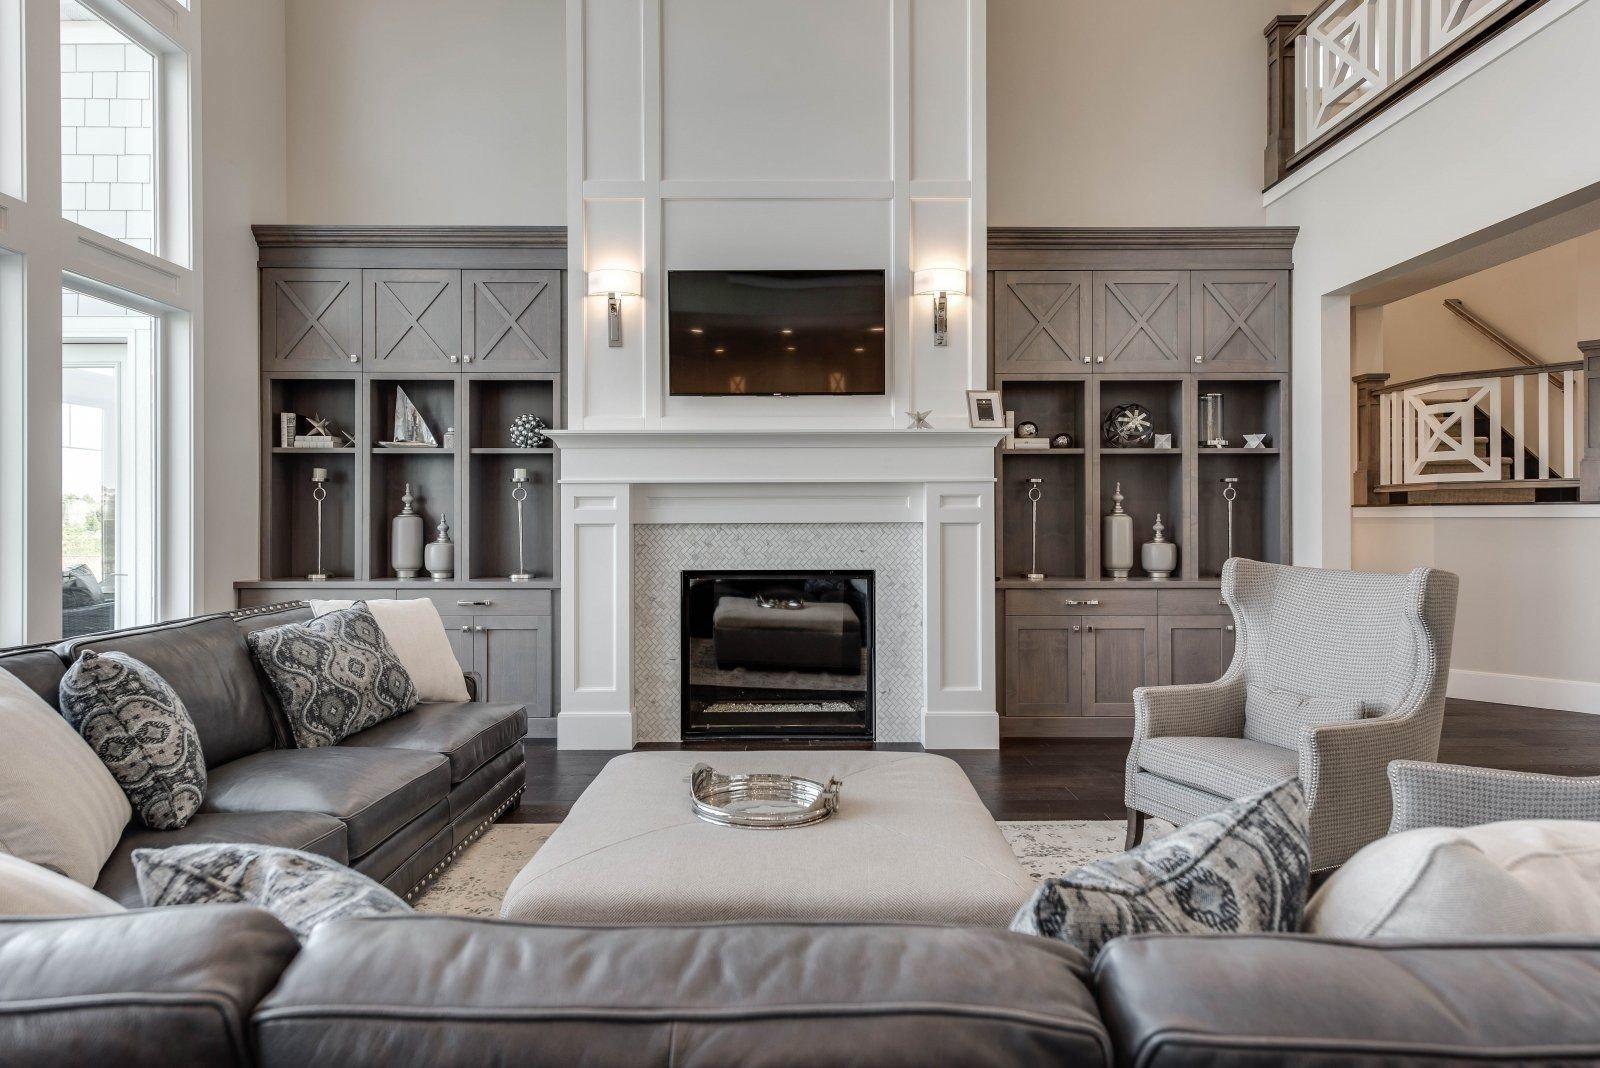 Living Room Decor with Fireplace Inspirational Salt Lake Parade Of Homes